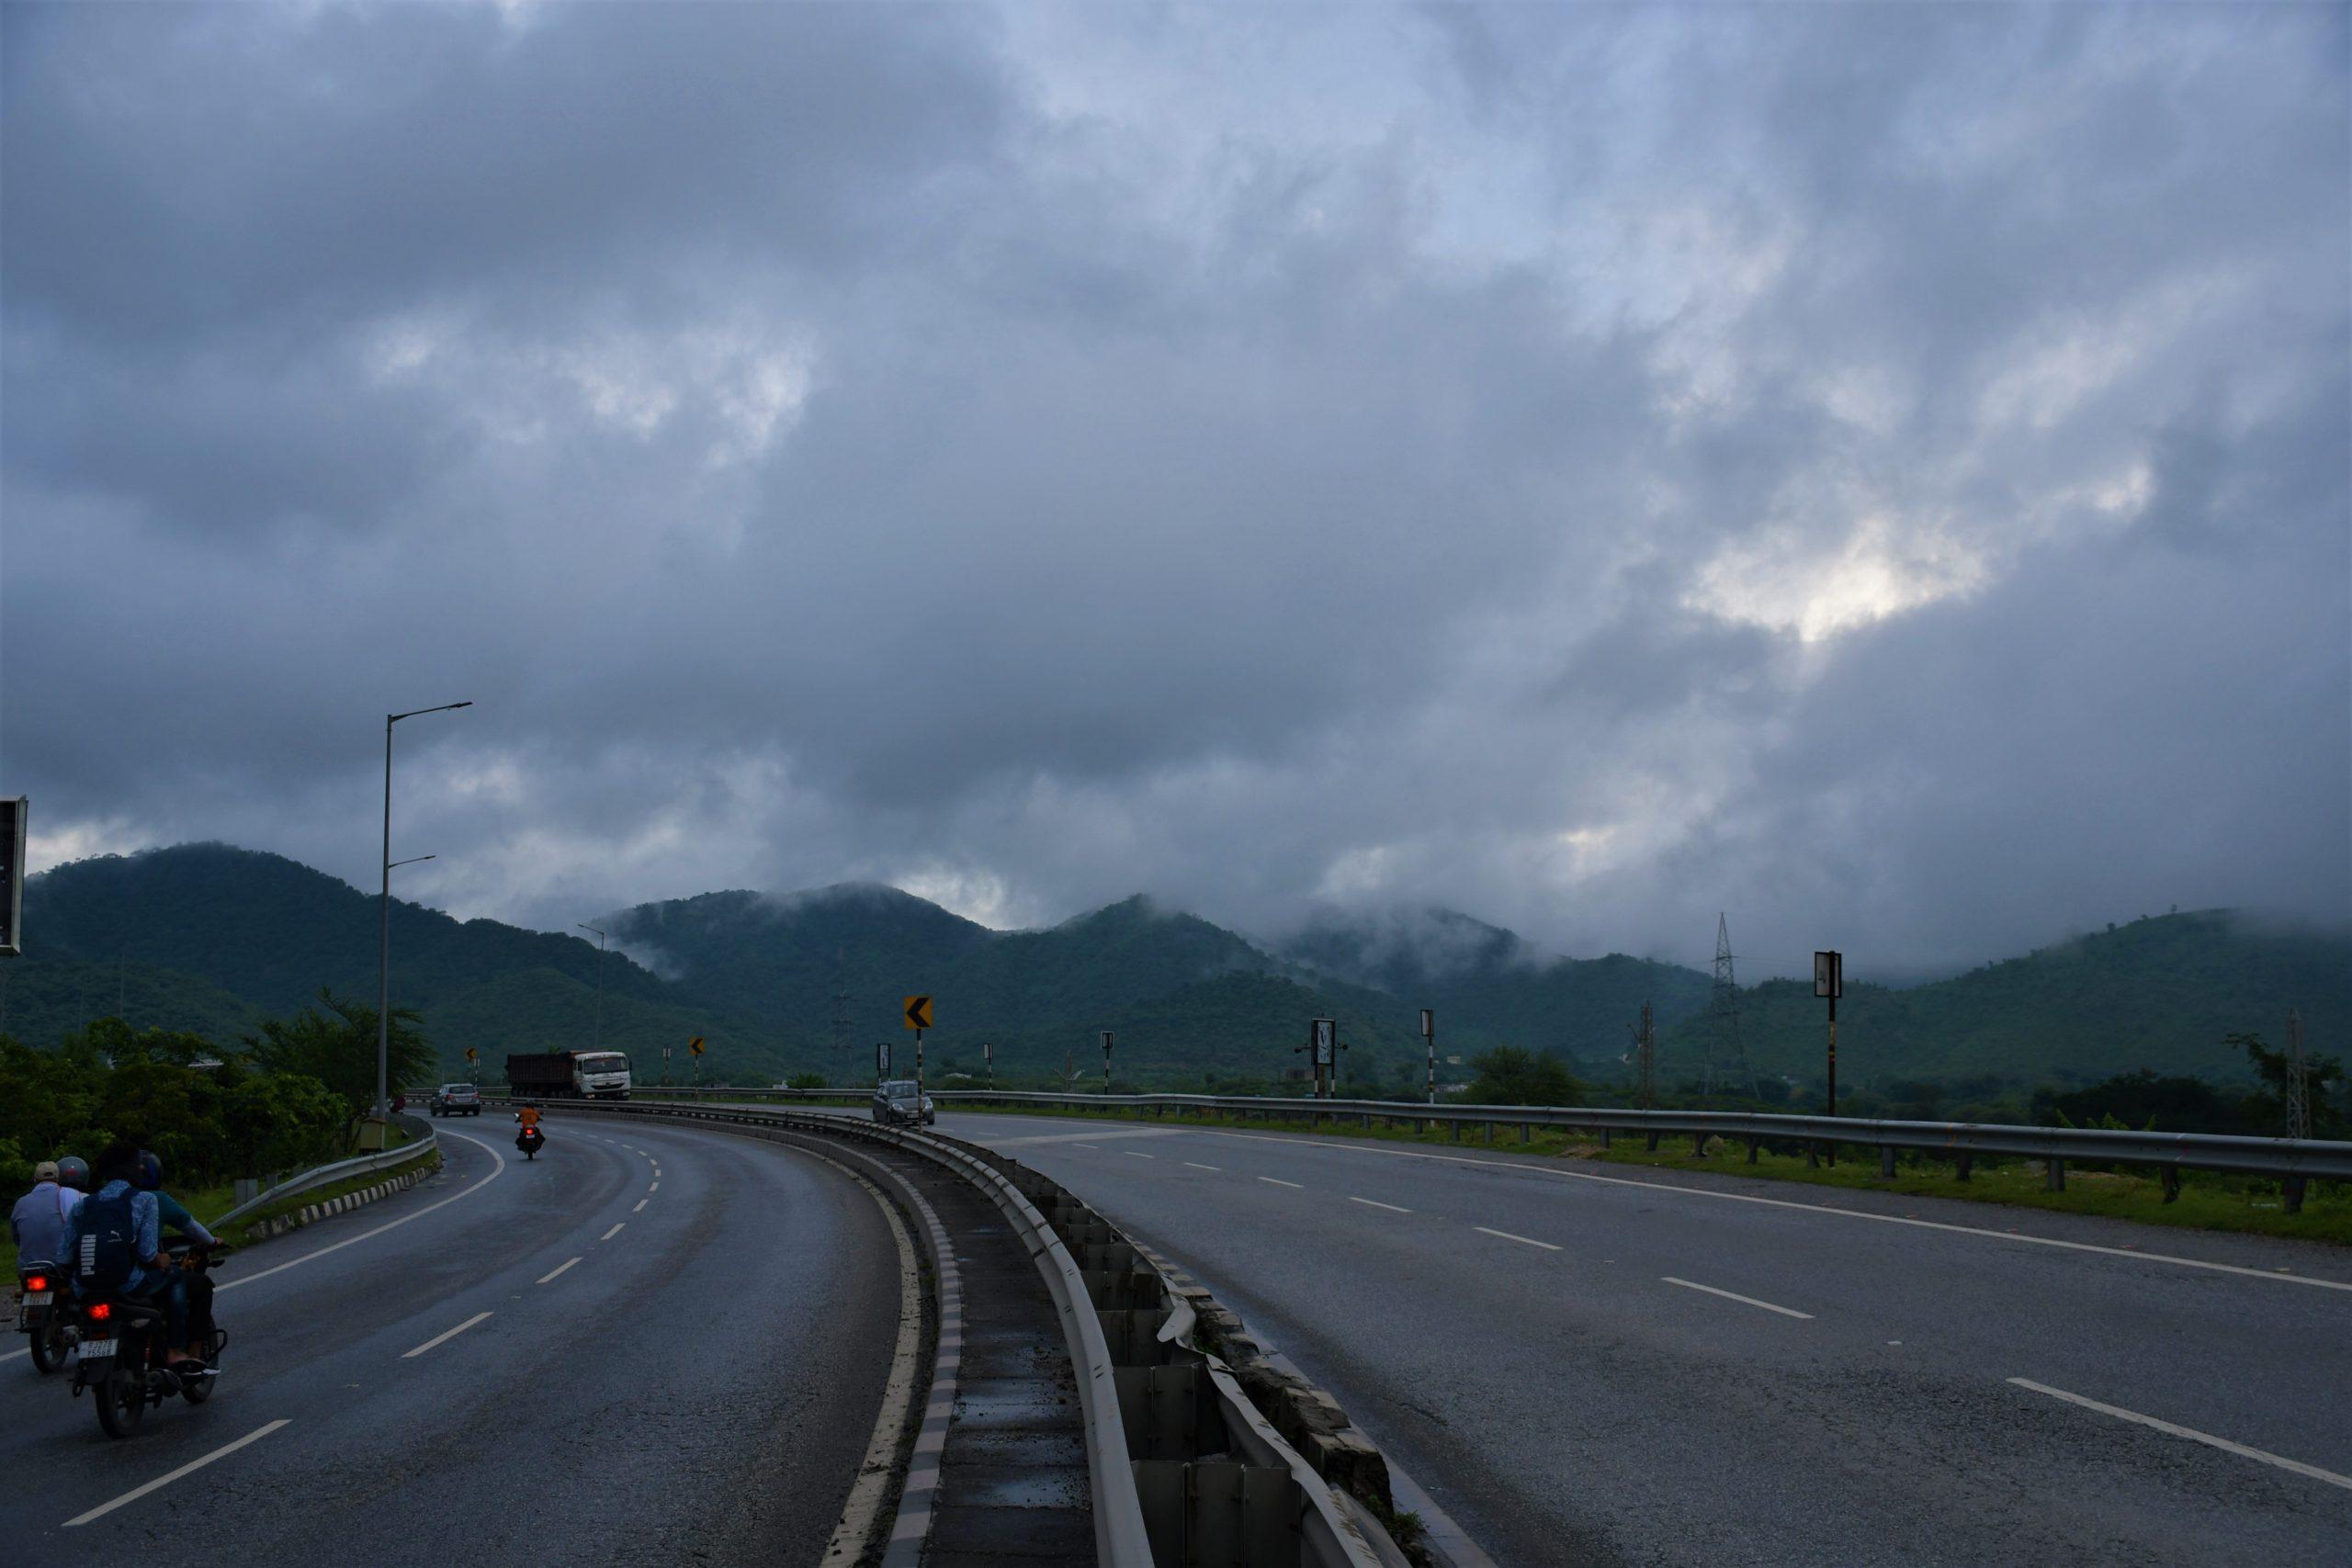 Udaipur highway during monsoon